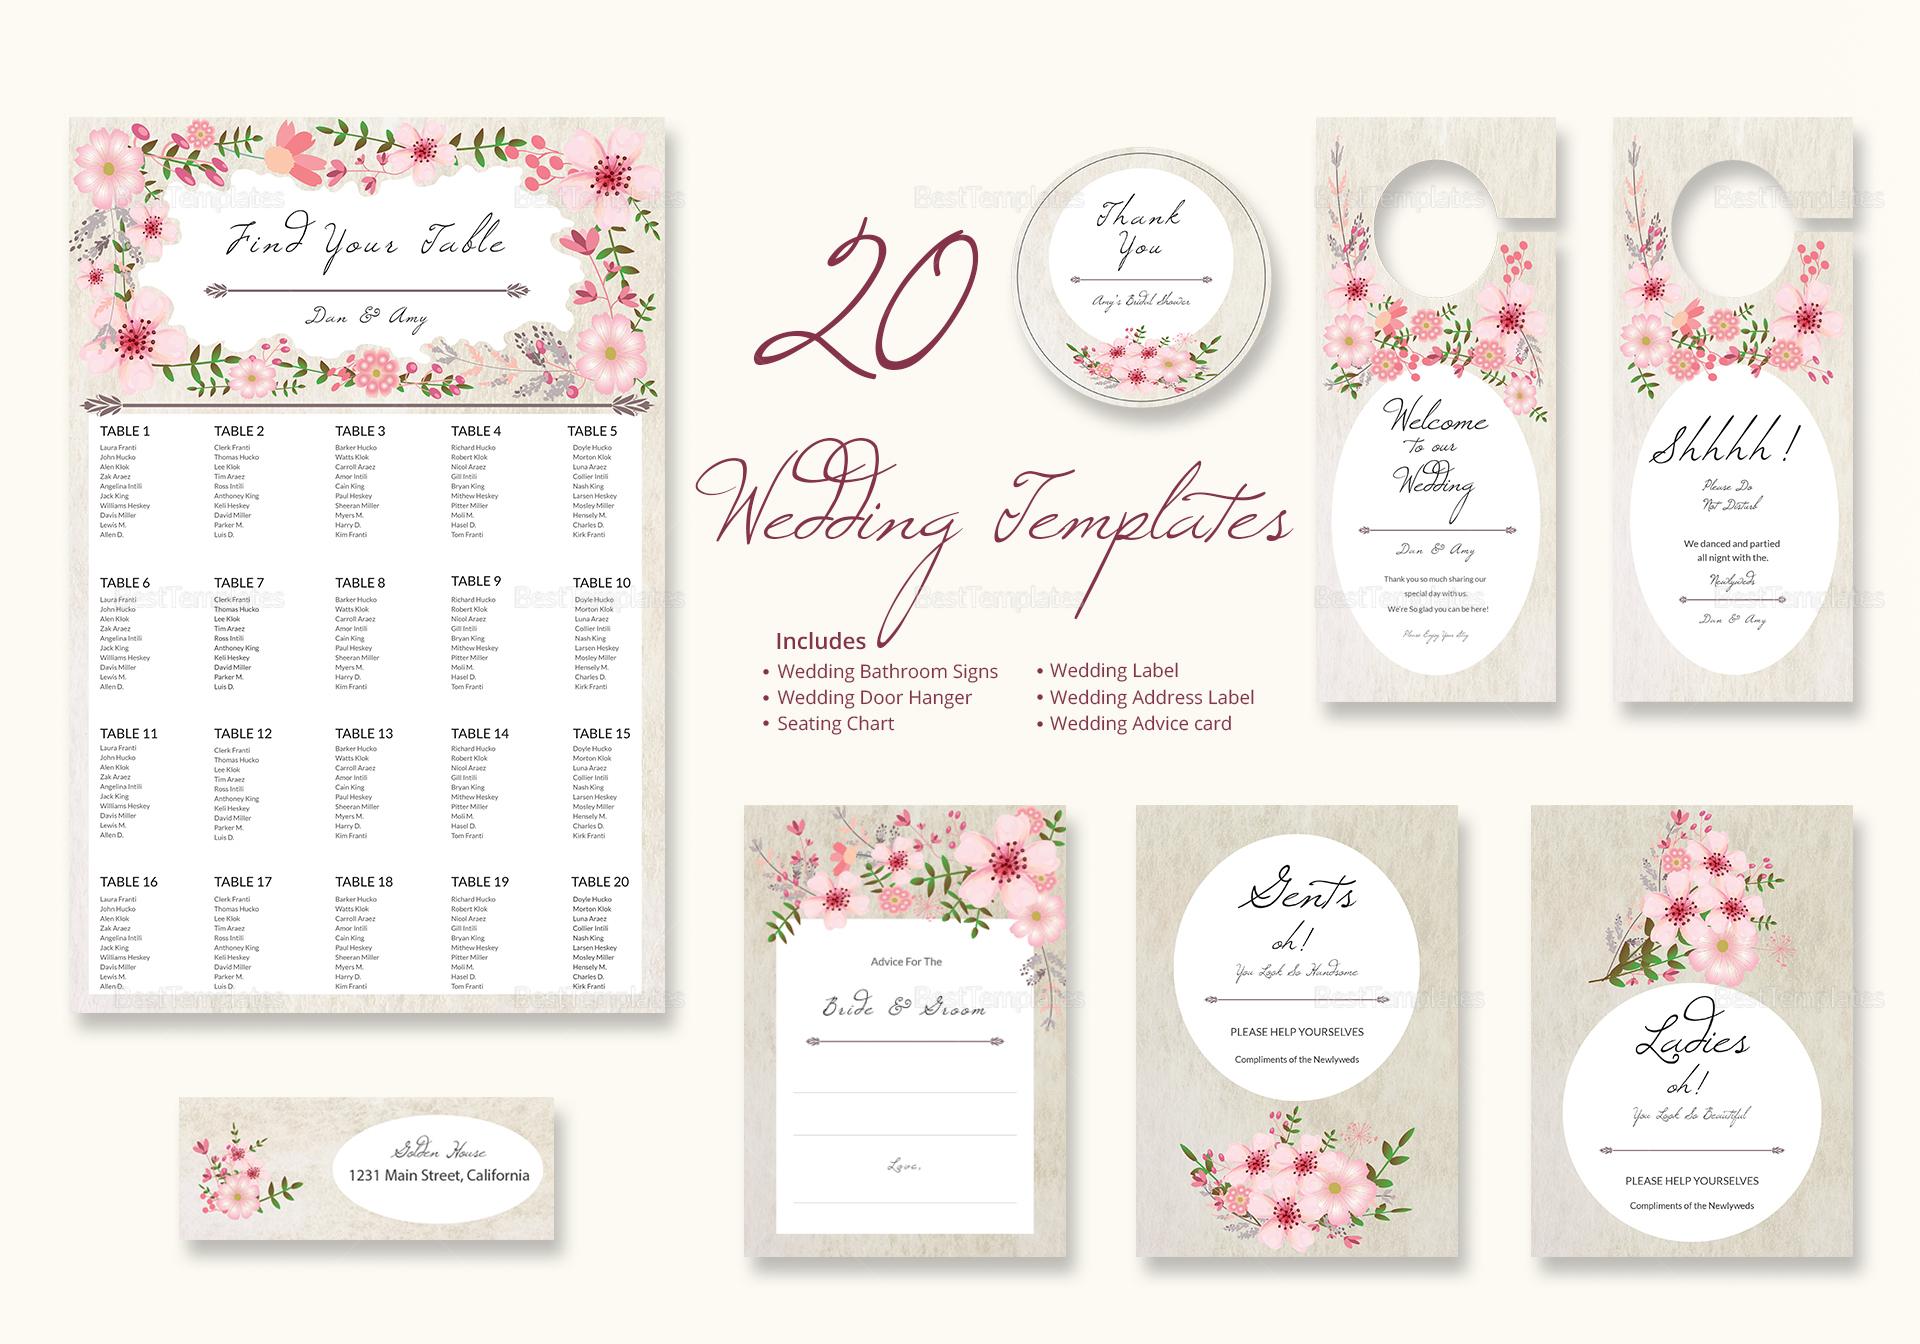 Pink Floral Wedding Templates